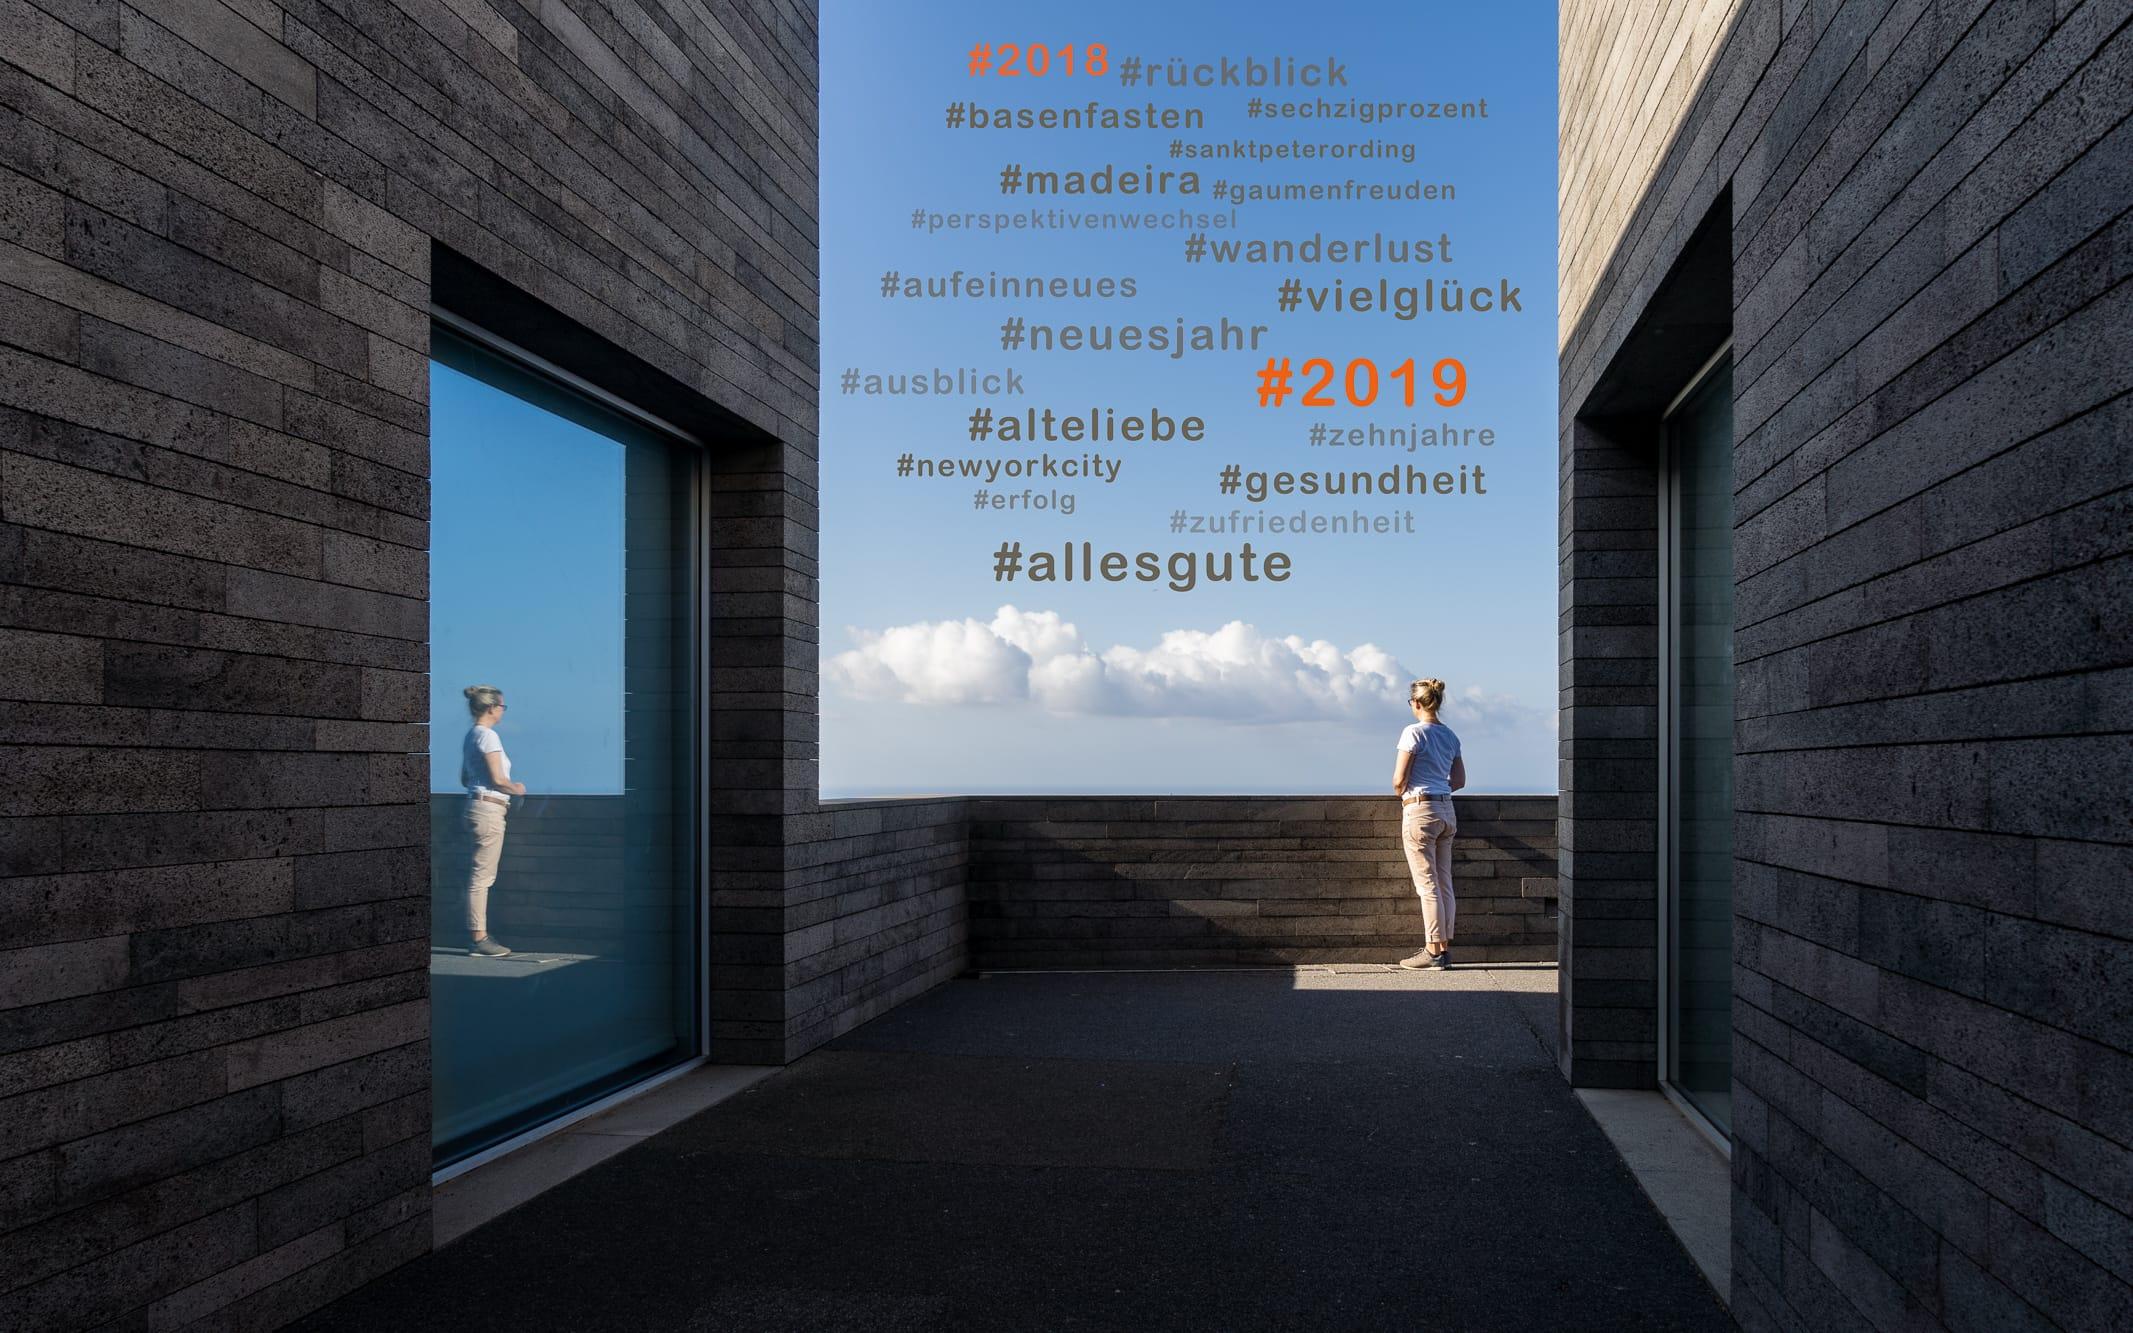 querformat-fotografie - Achim Katzberg - - [MUDAS - Madeira / August 2018]